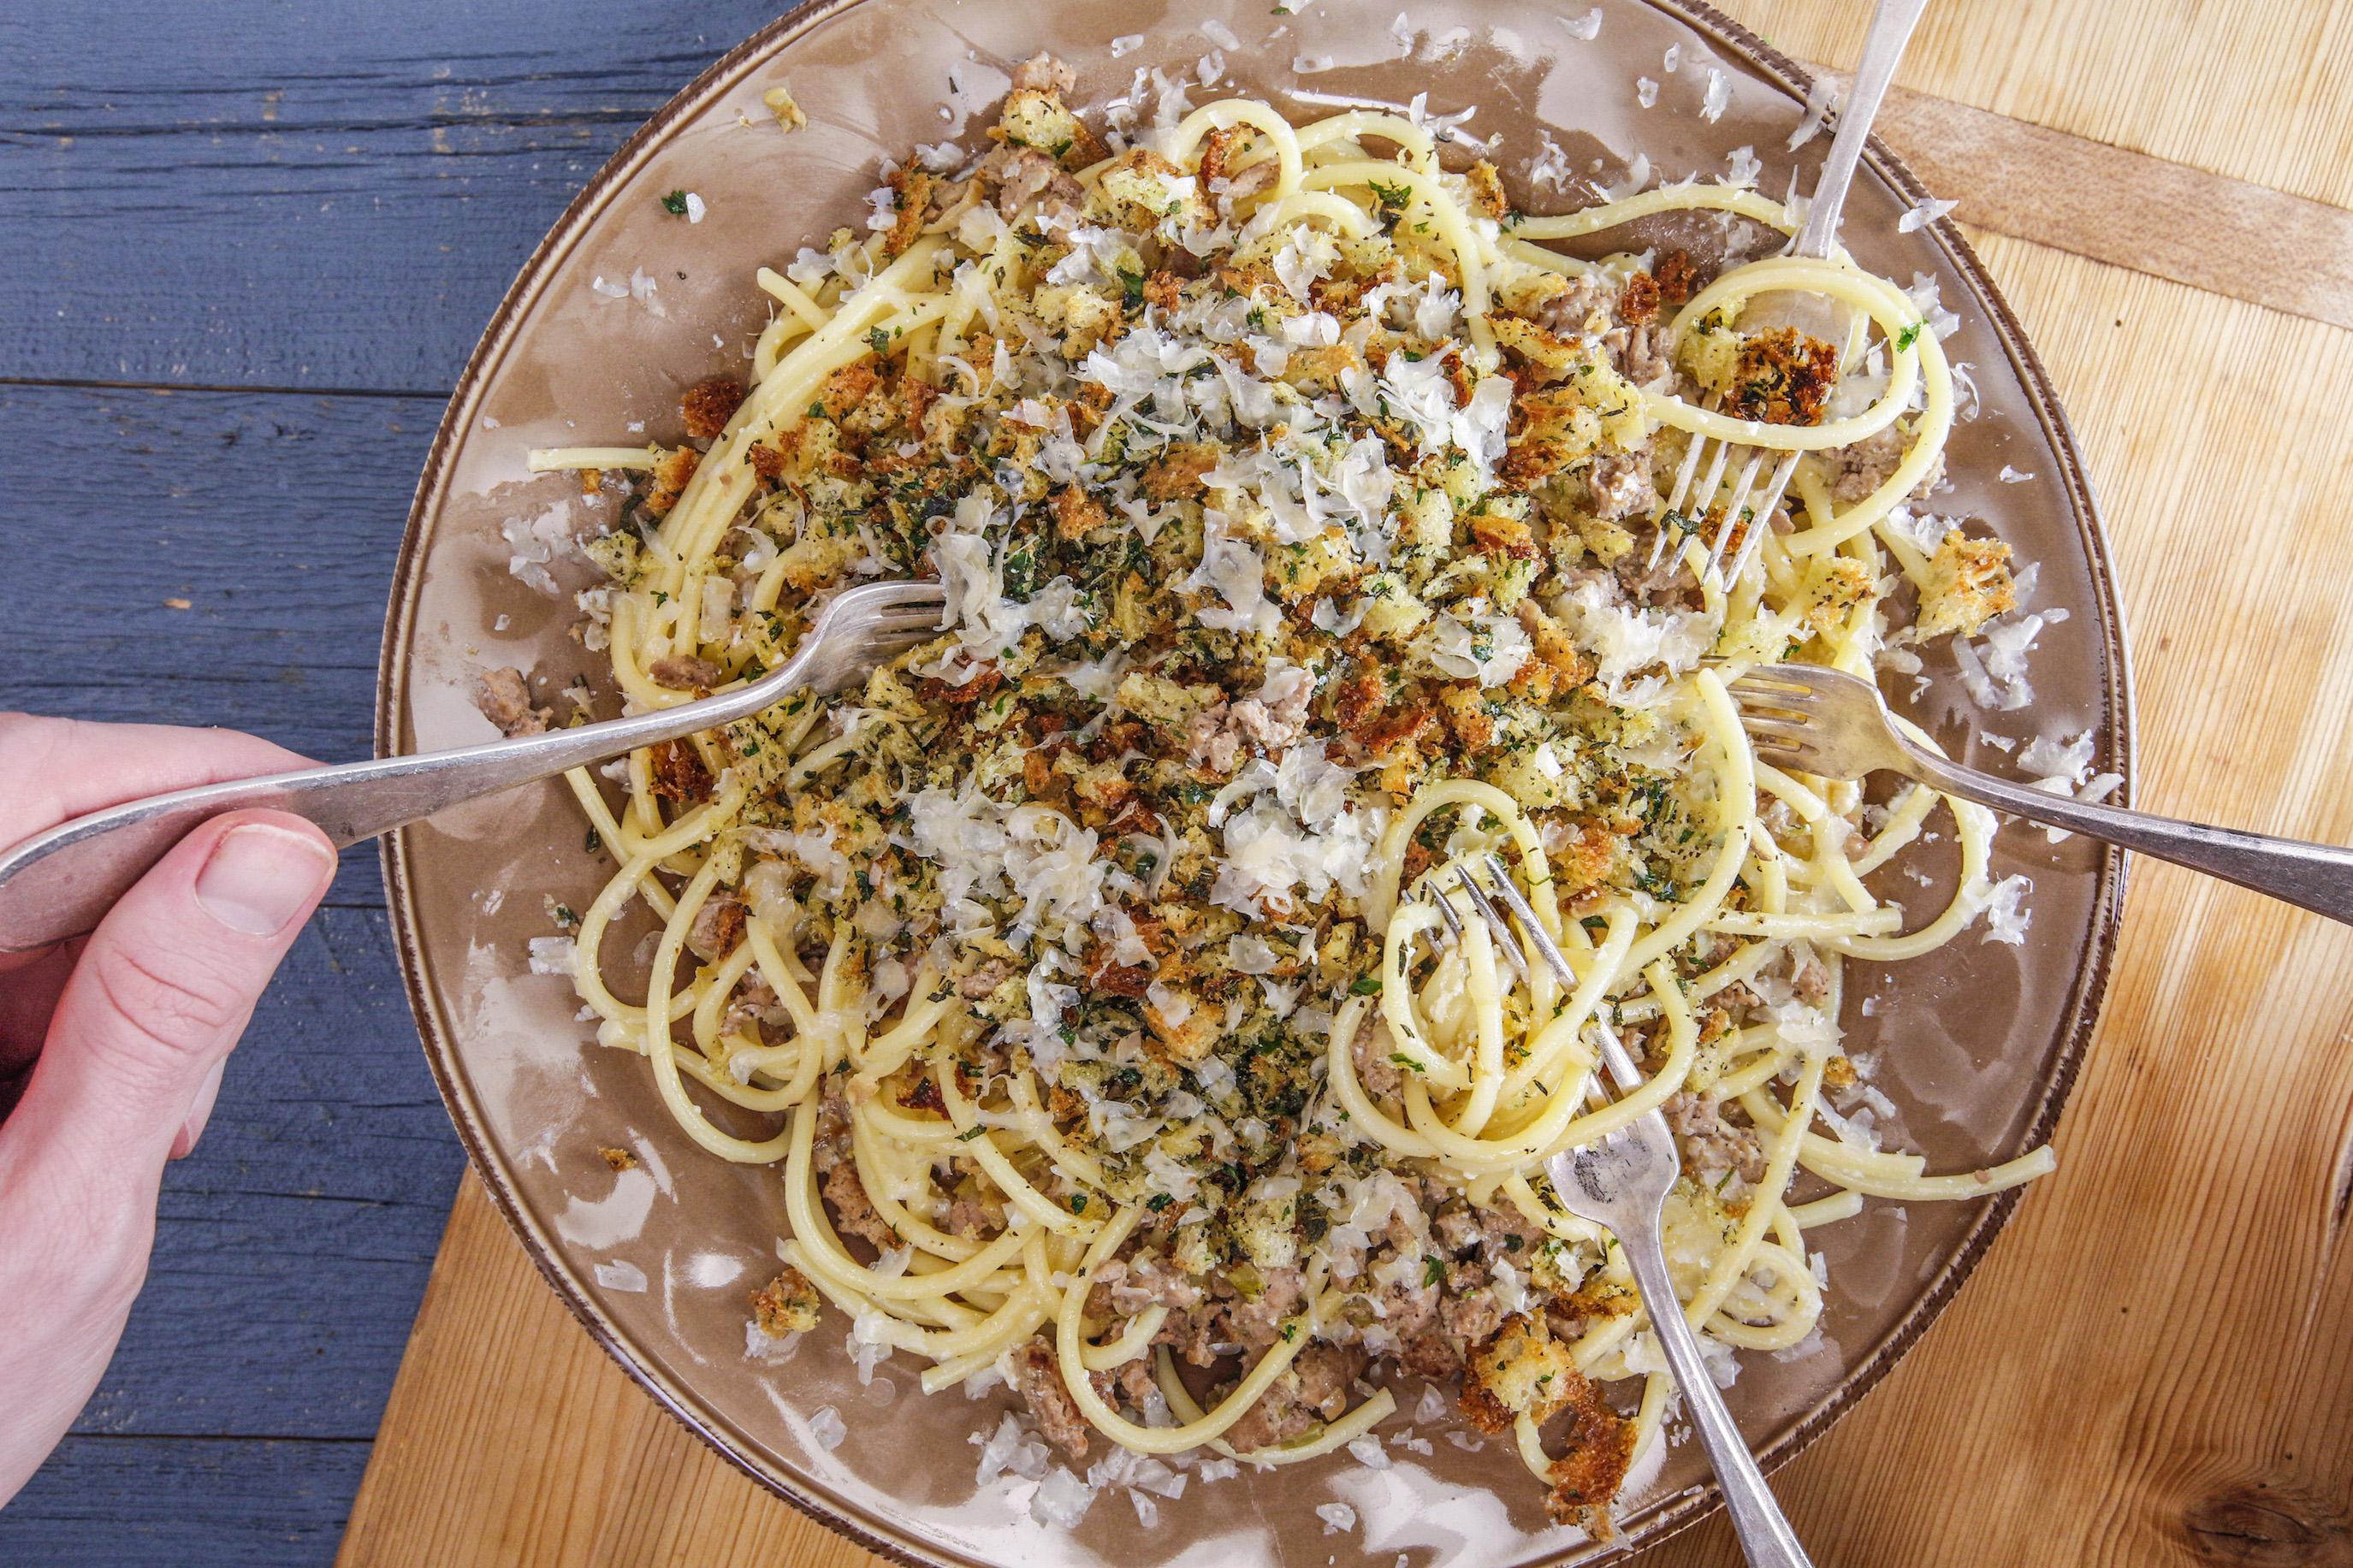 Rachael's Buttermilk Bucatini with Turkey Ragu and Herb Breadcrumbs